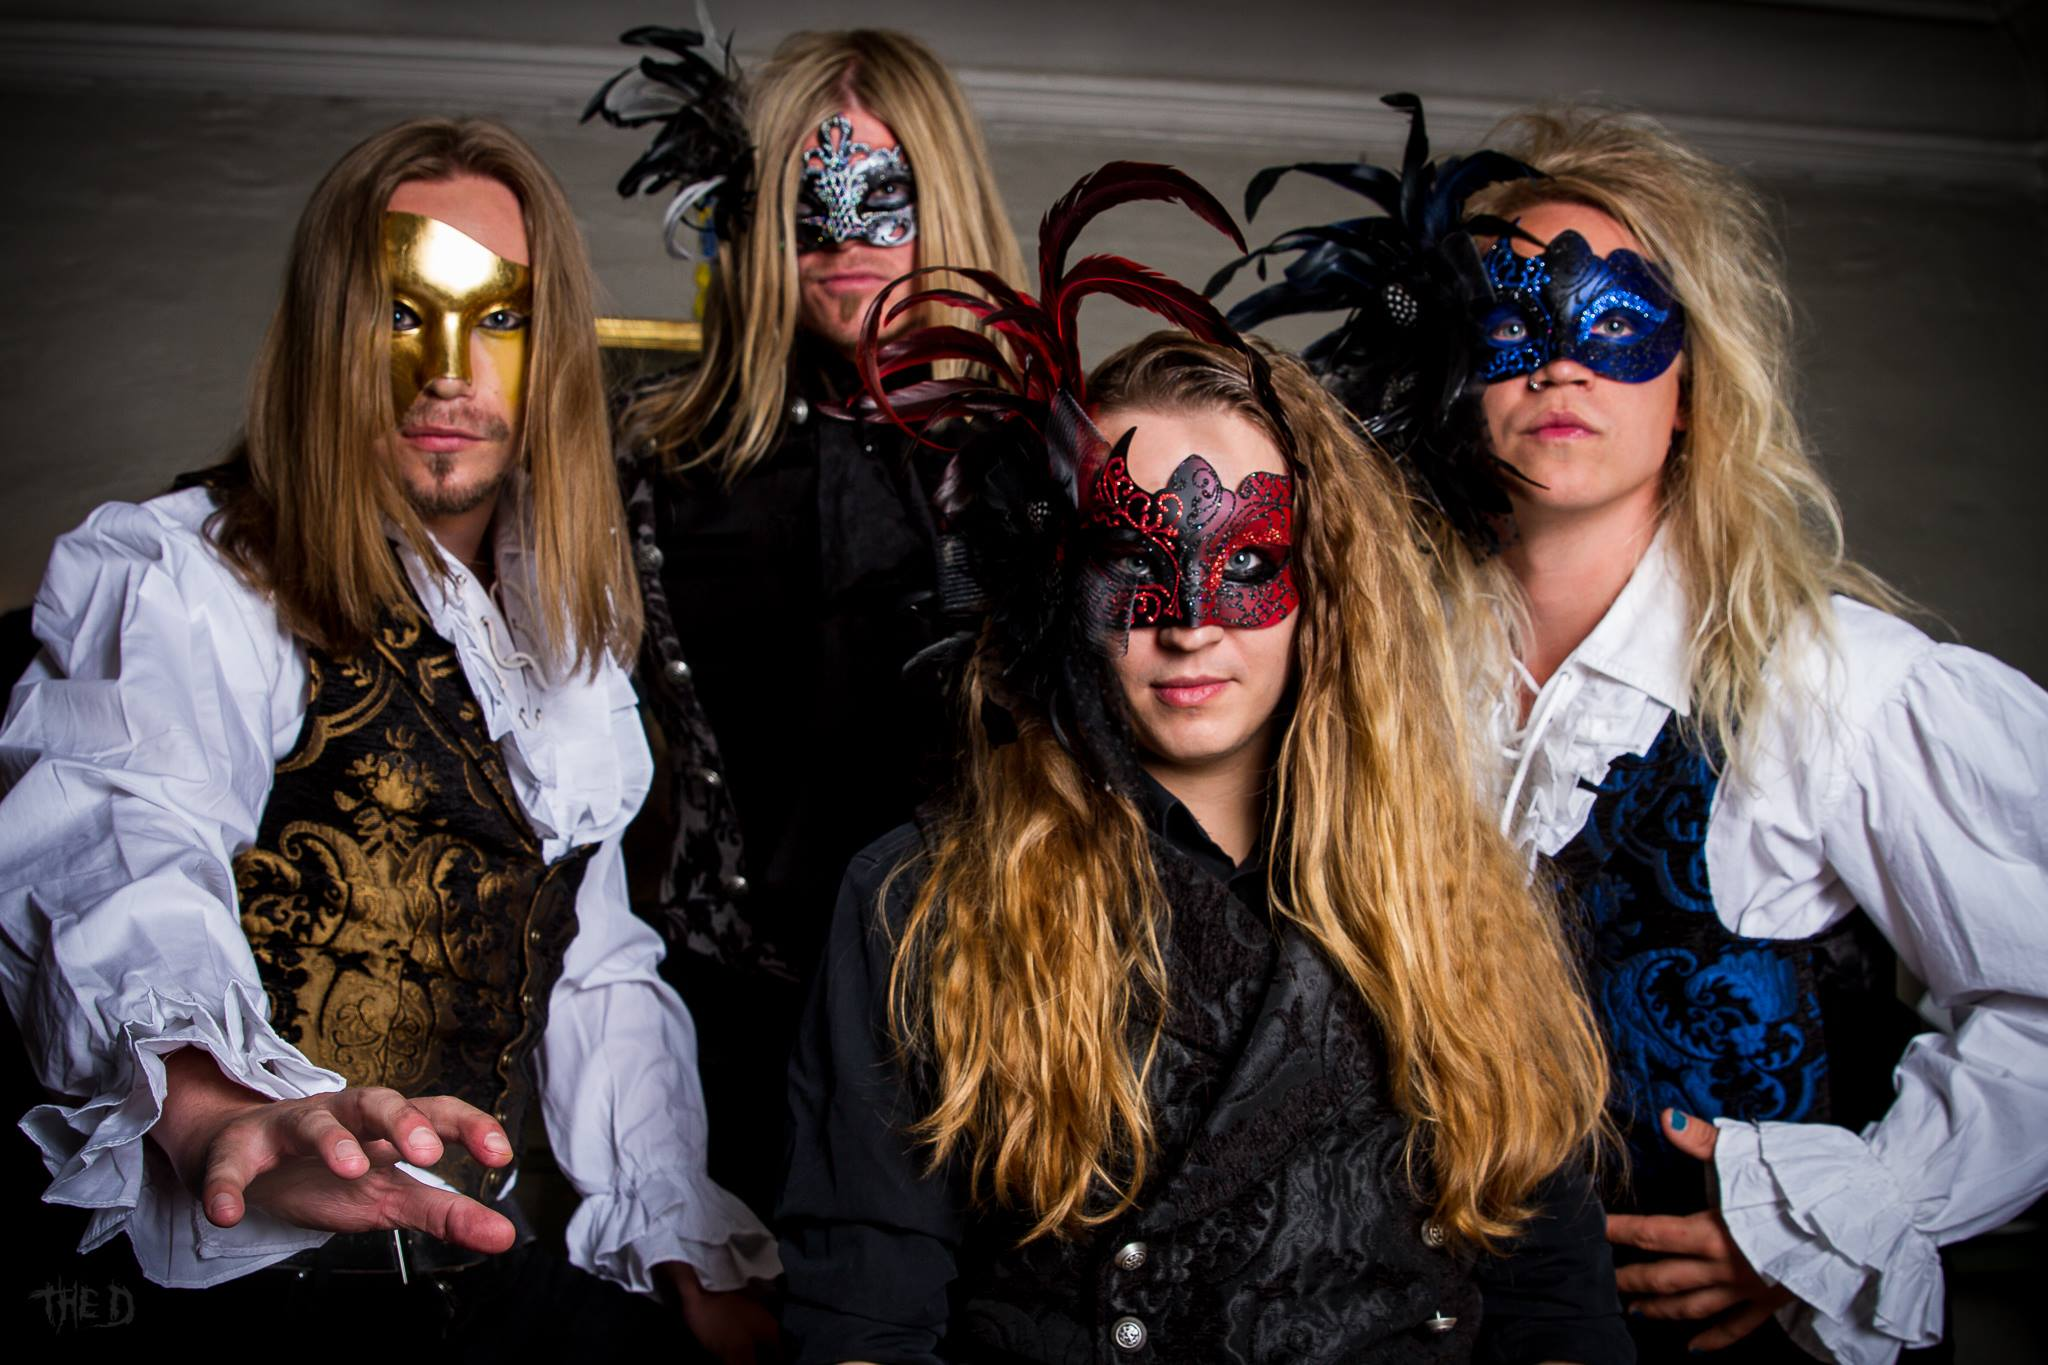 The Grand Masquerade